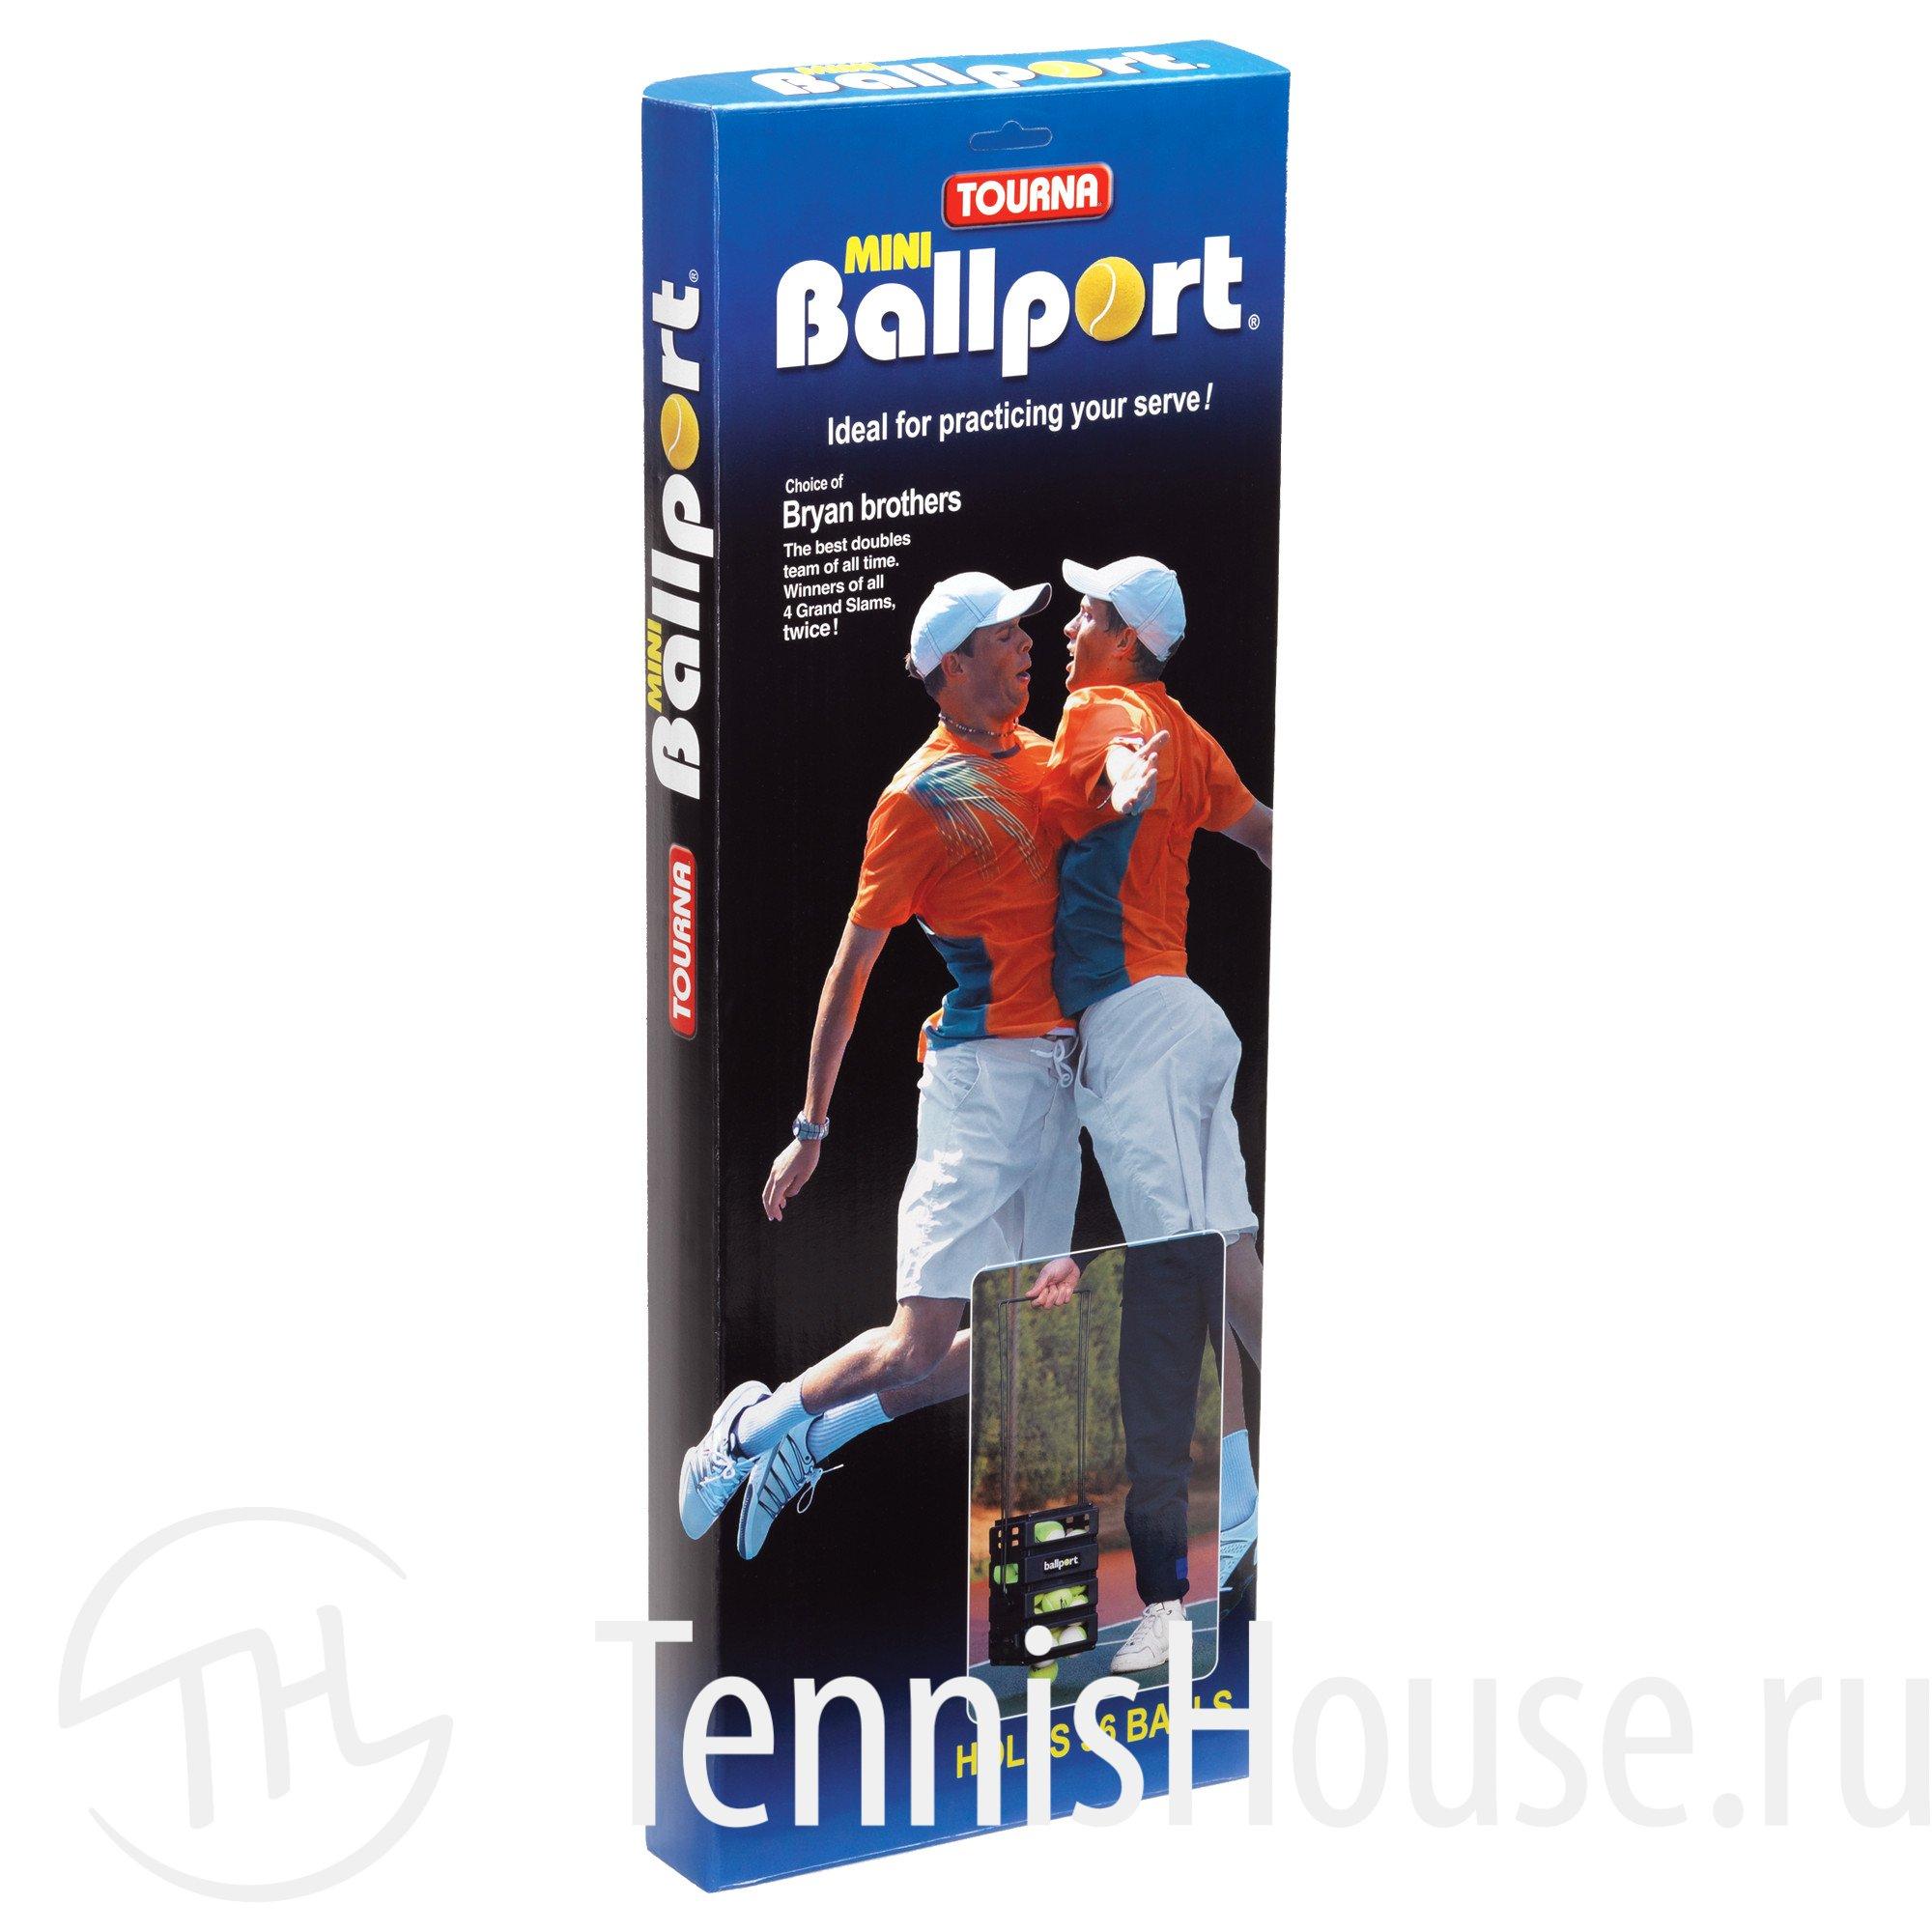 Корзина на 36 мячей Tourna BallPort Unique Цвет Голубой BP36-106